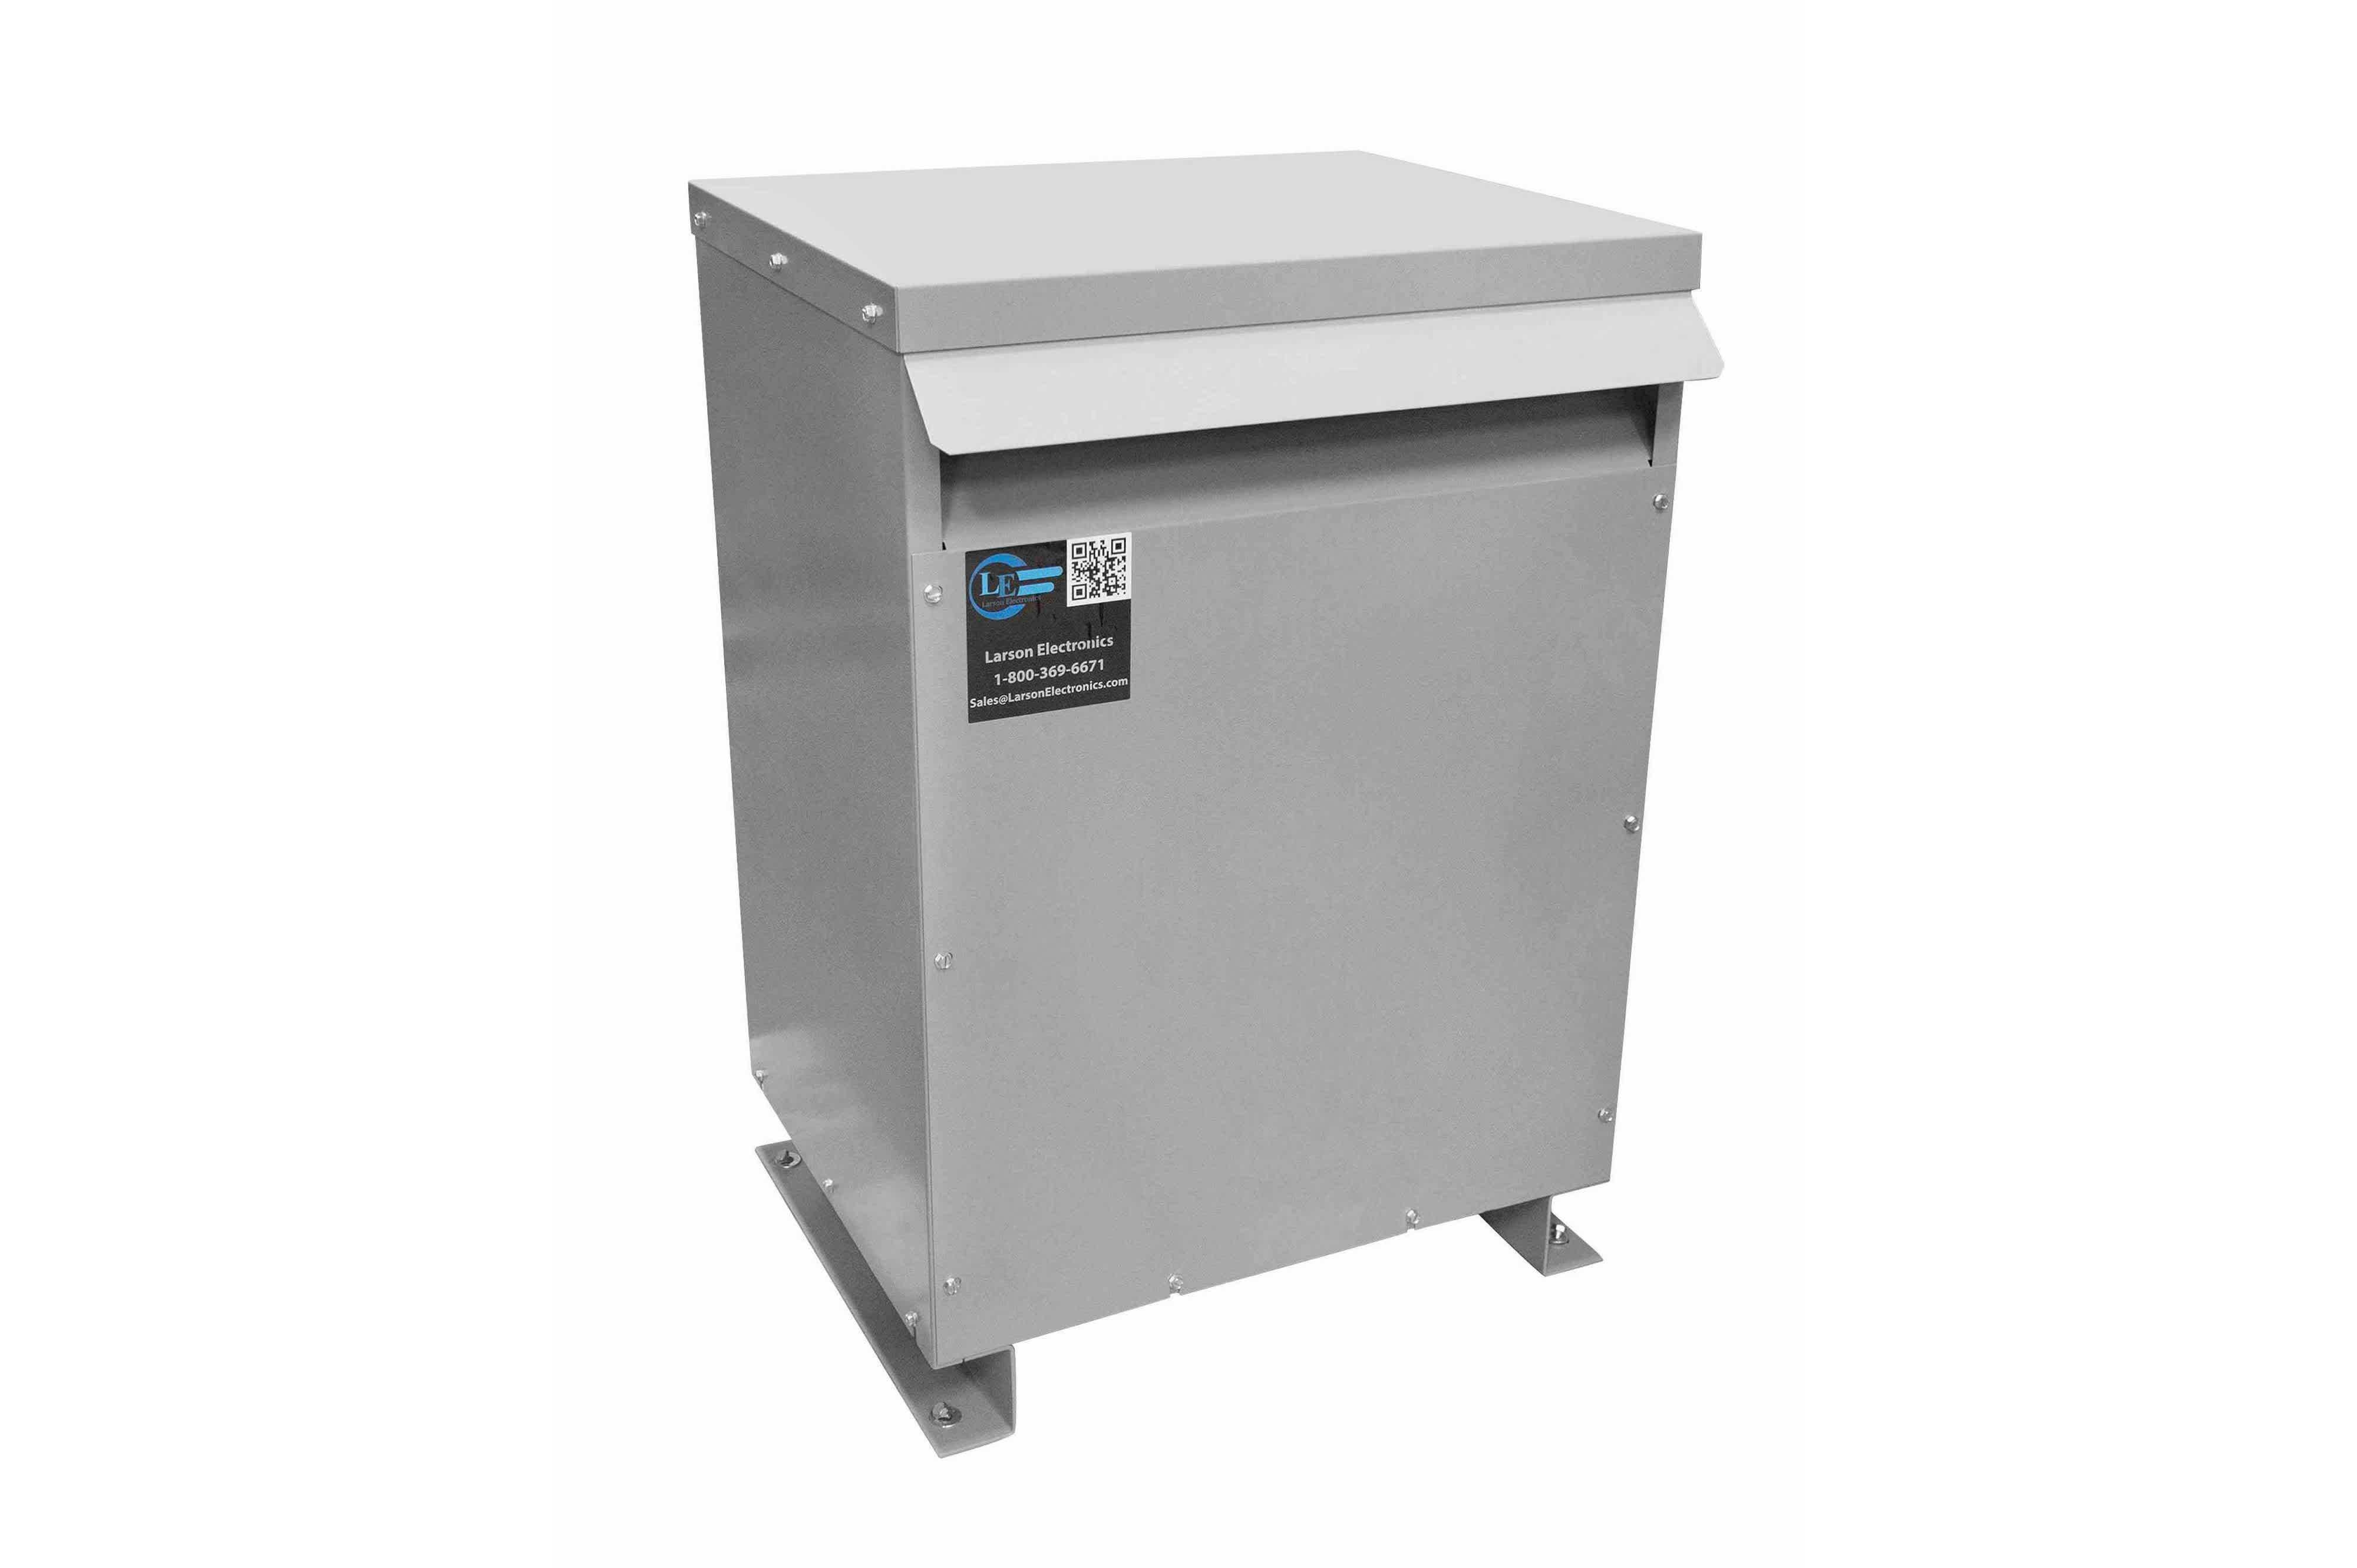 750 kVA 3PH Isolation Transformer, 575V Wye Primary, 240V Delta Secondary, N3R, Ventilated, 60 Hz